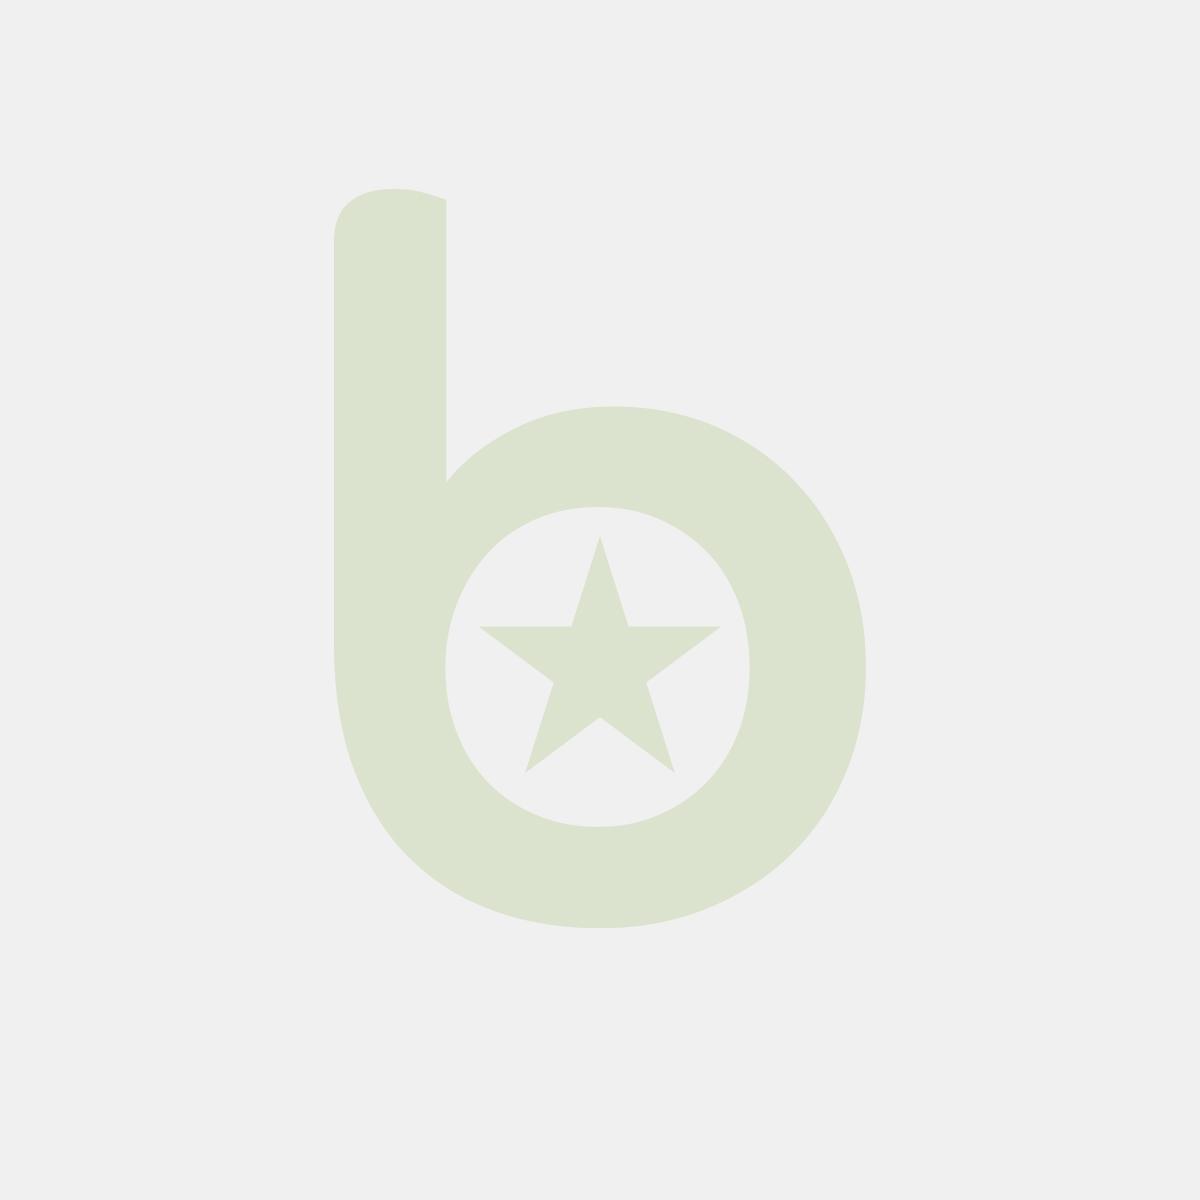 Torba biała BN 290x140x50 op.1000szt